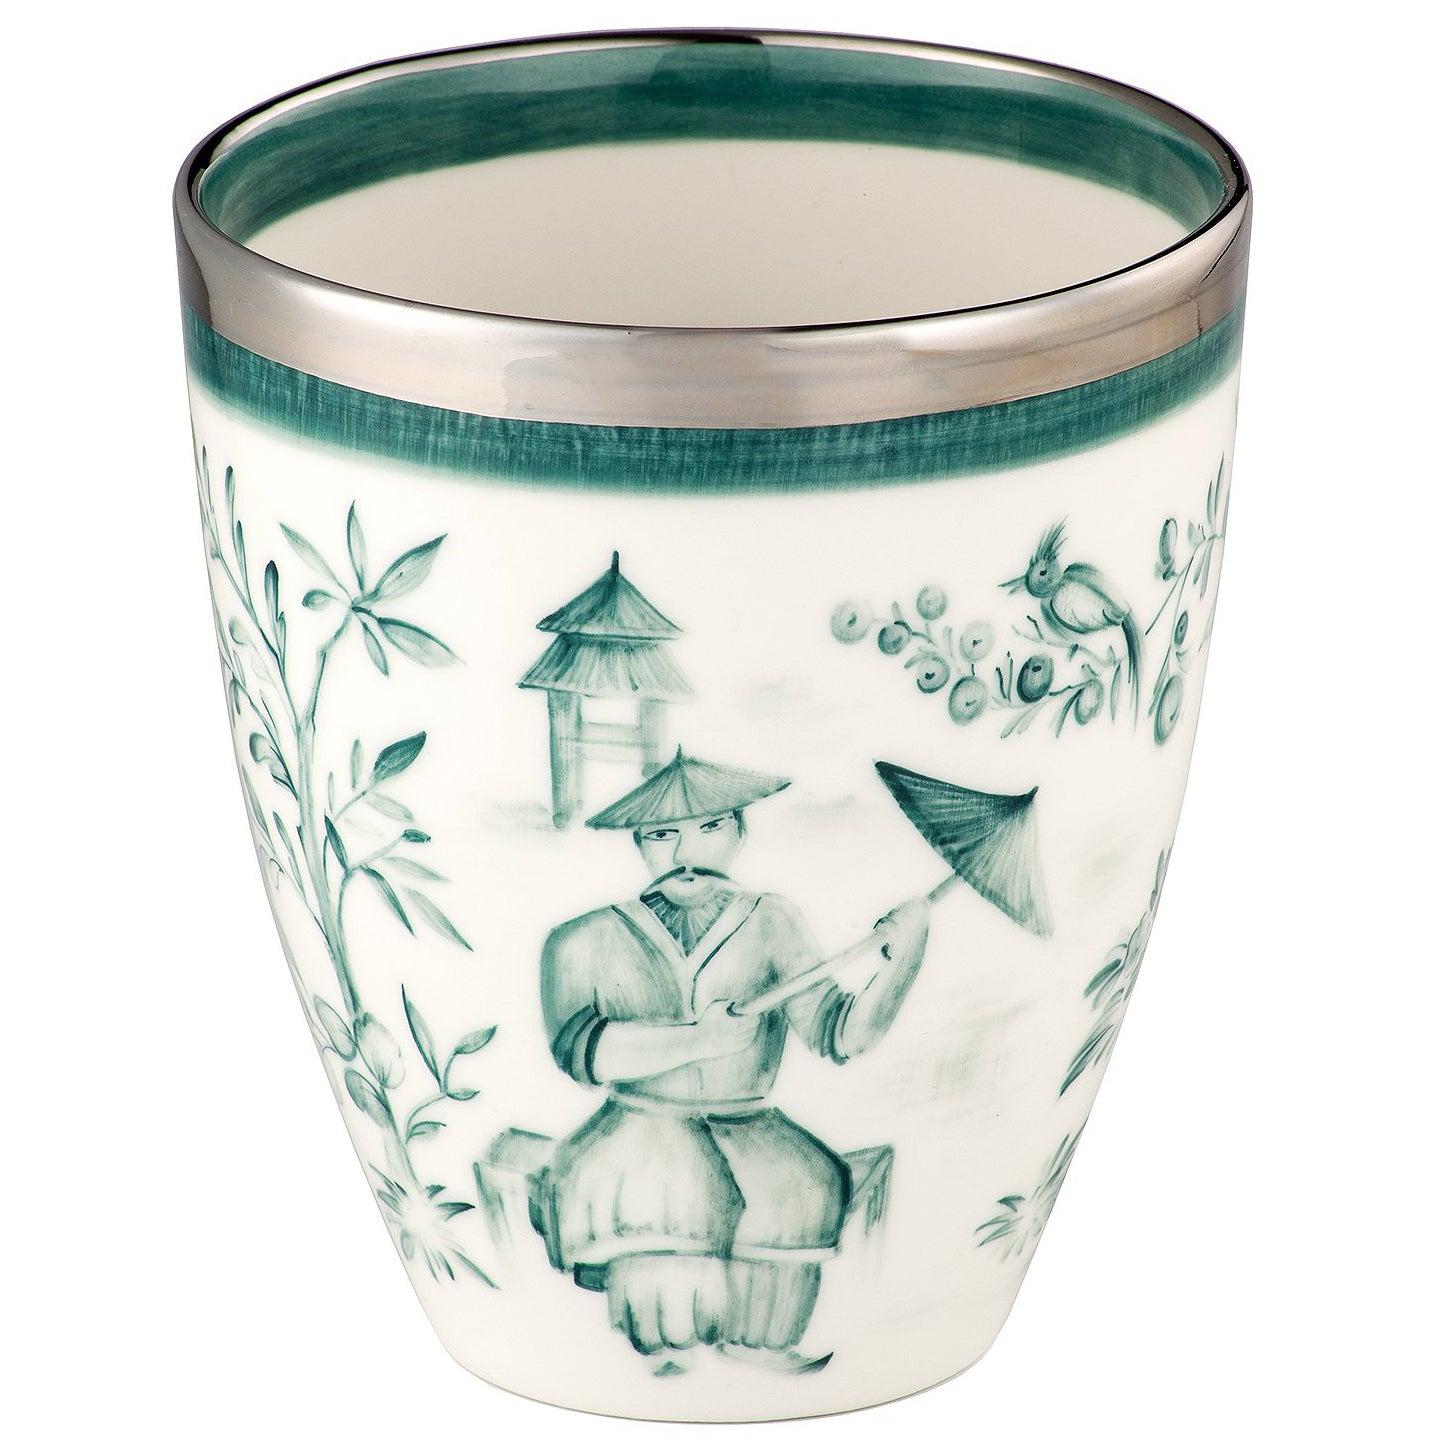 Chinoiserie Handpainted Porcelain Vase  Sofina Boutique Kitzbuehel